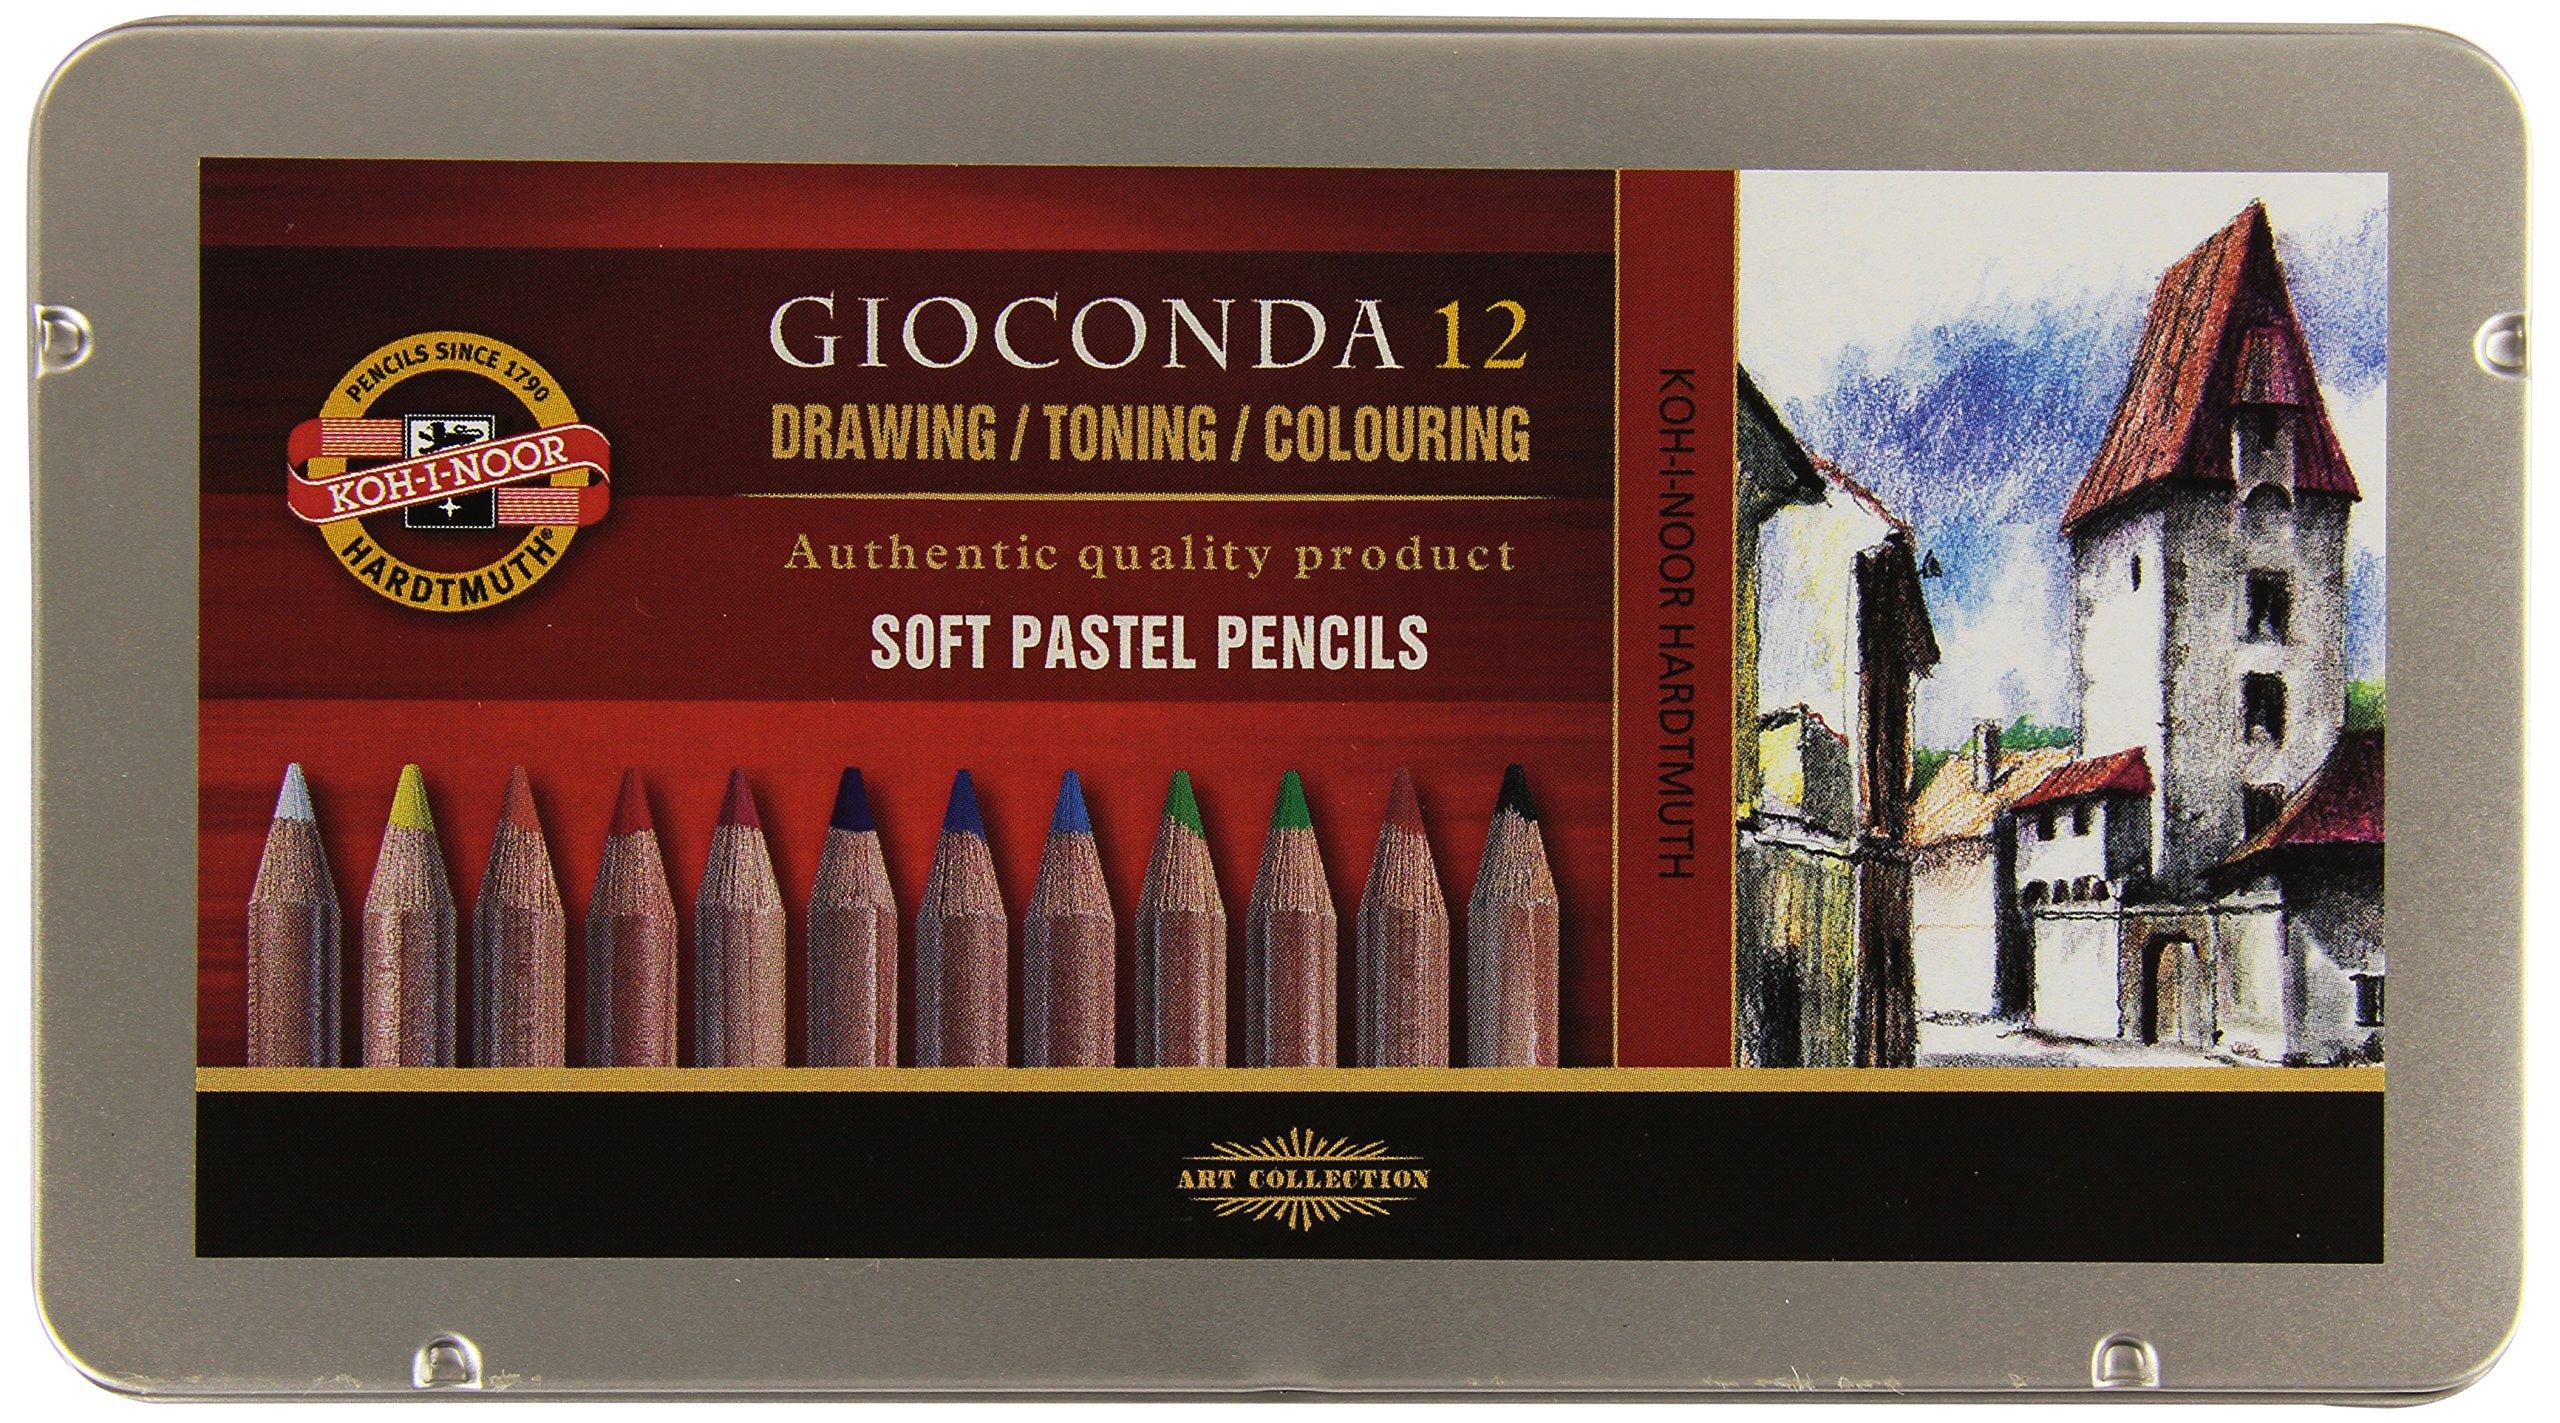 KOH-I-NOOR Artist's Soft Pastel Pencils (Set of 12)